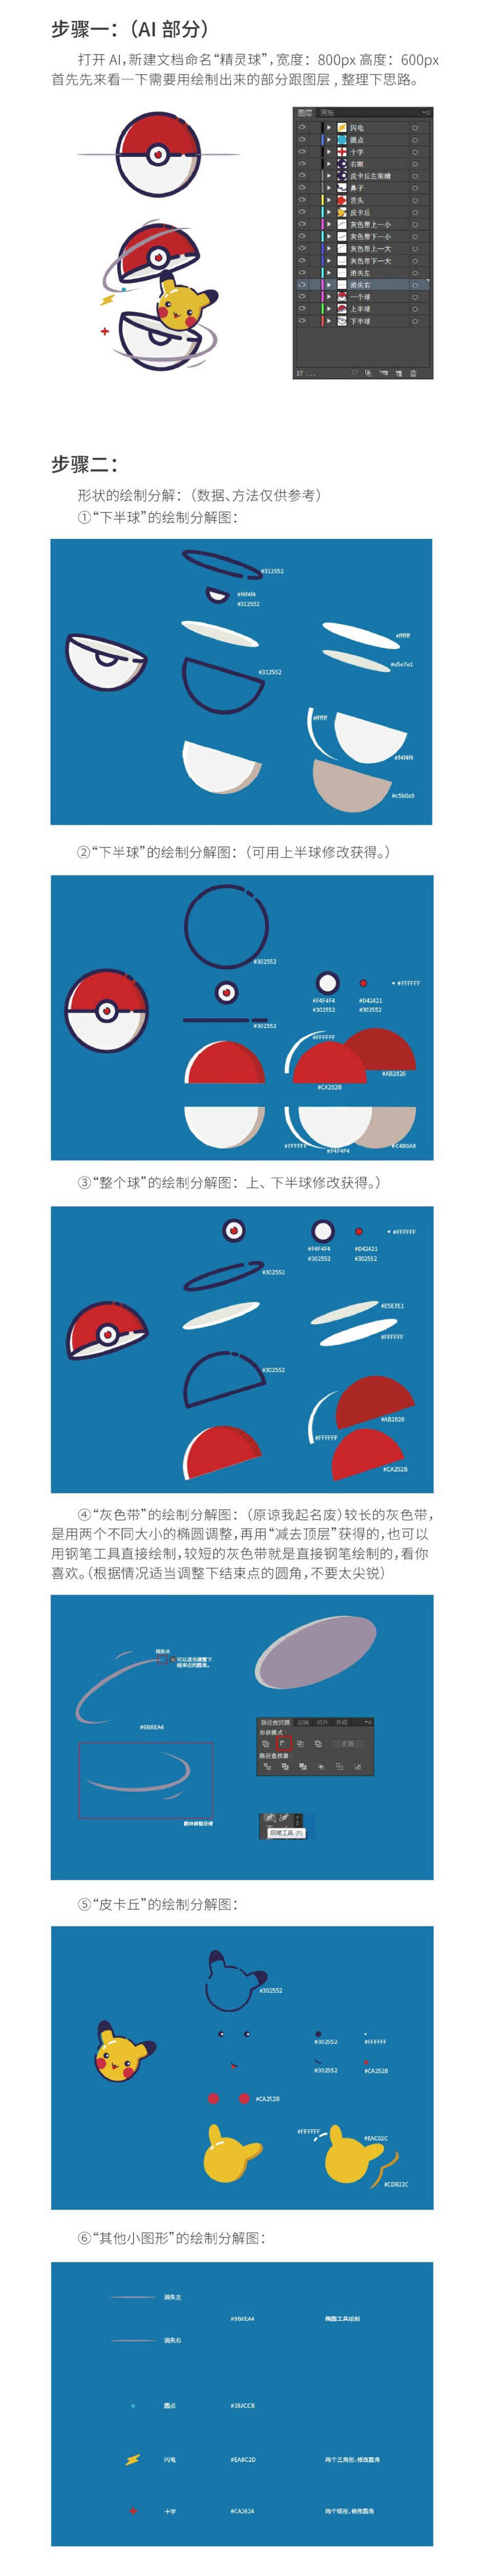 Illustrator结合AE绘制可爱的皮卡丘动画效果,PS教程,思缘教程网